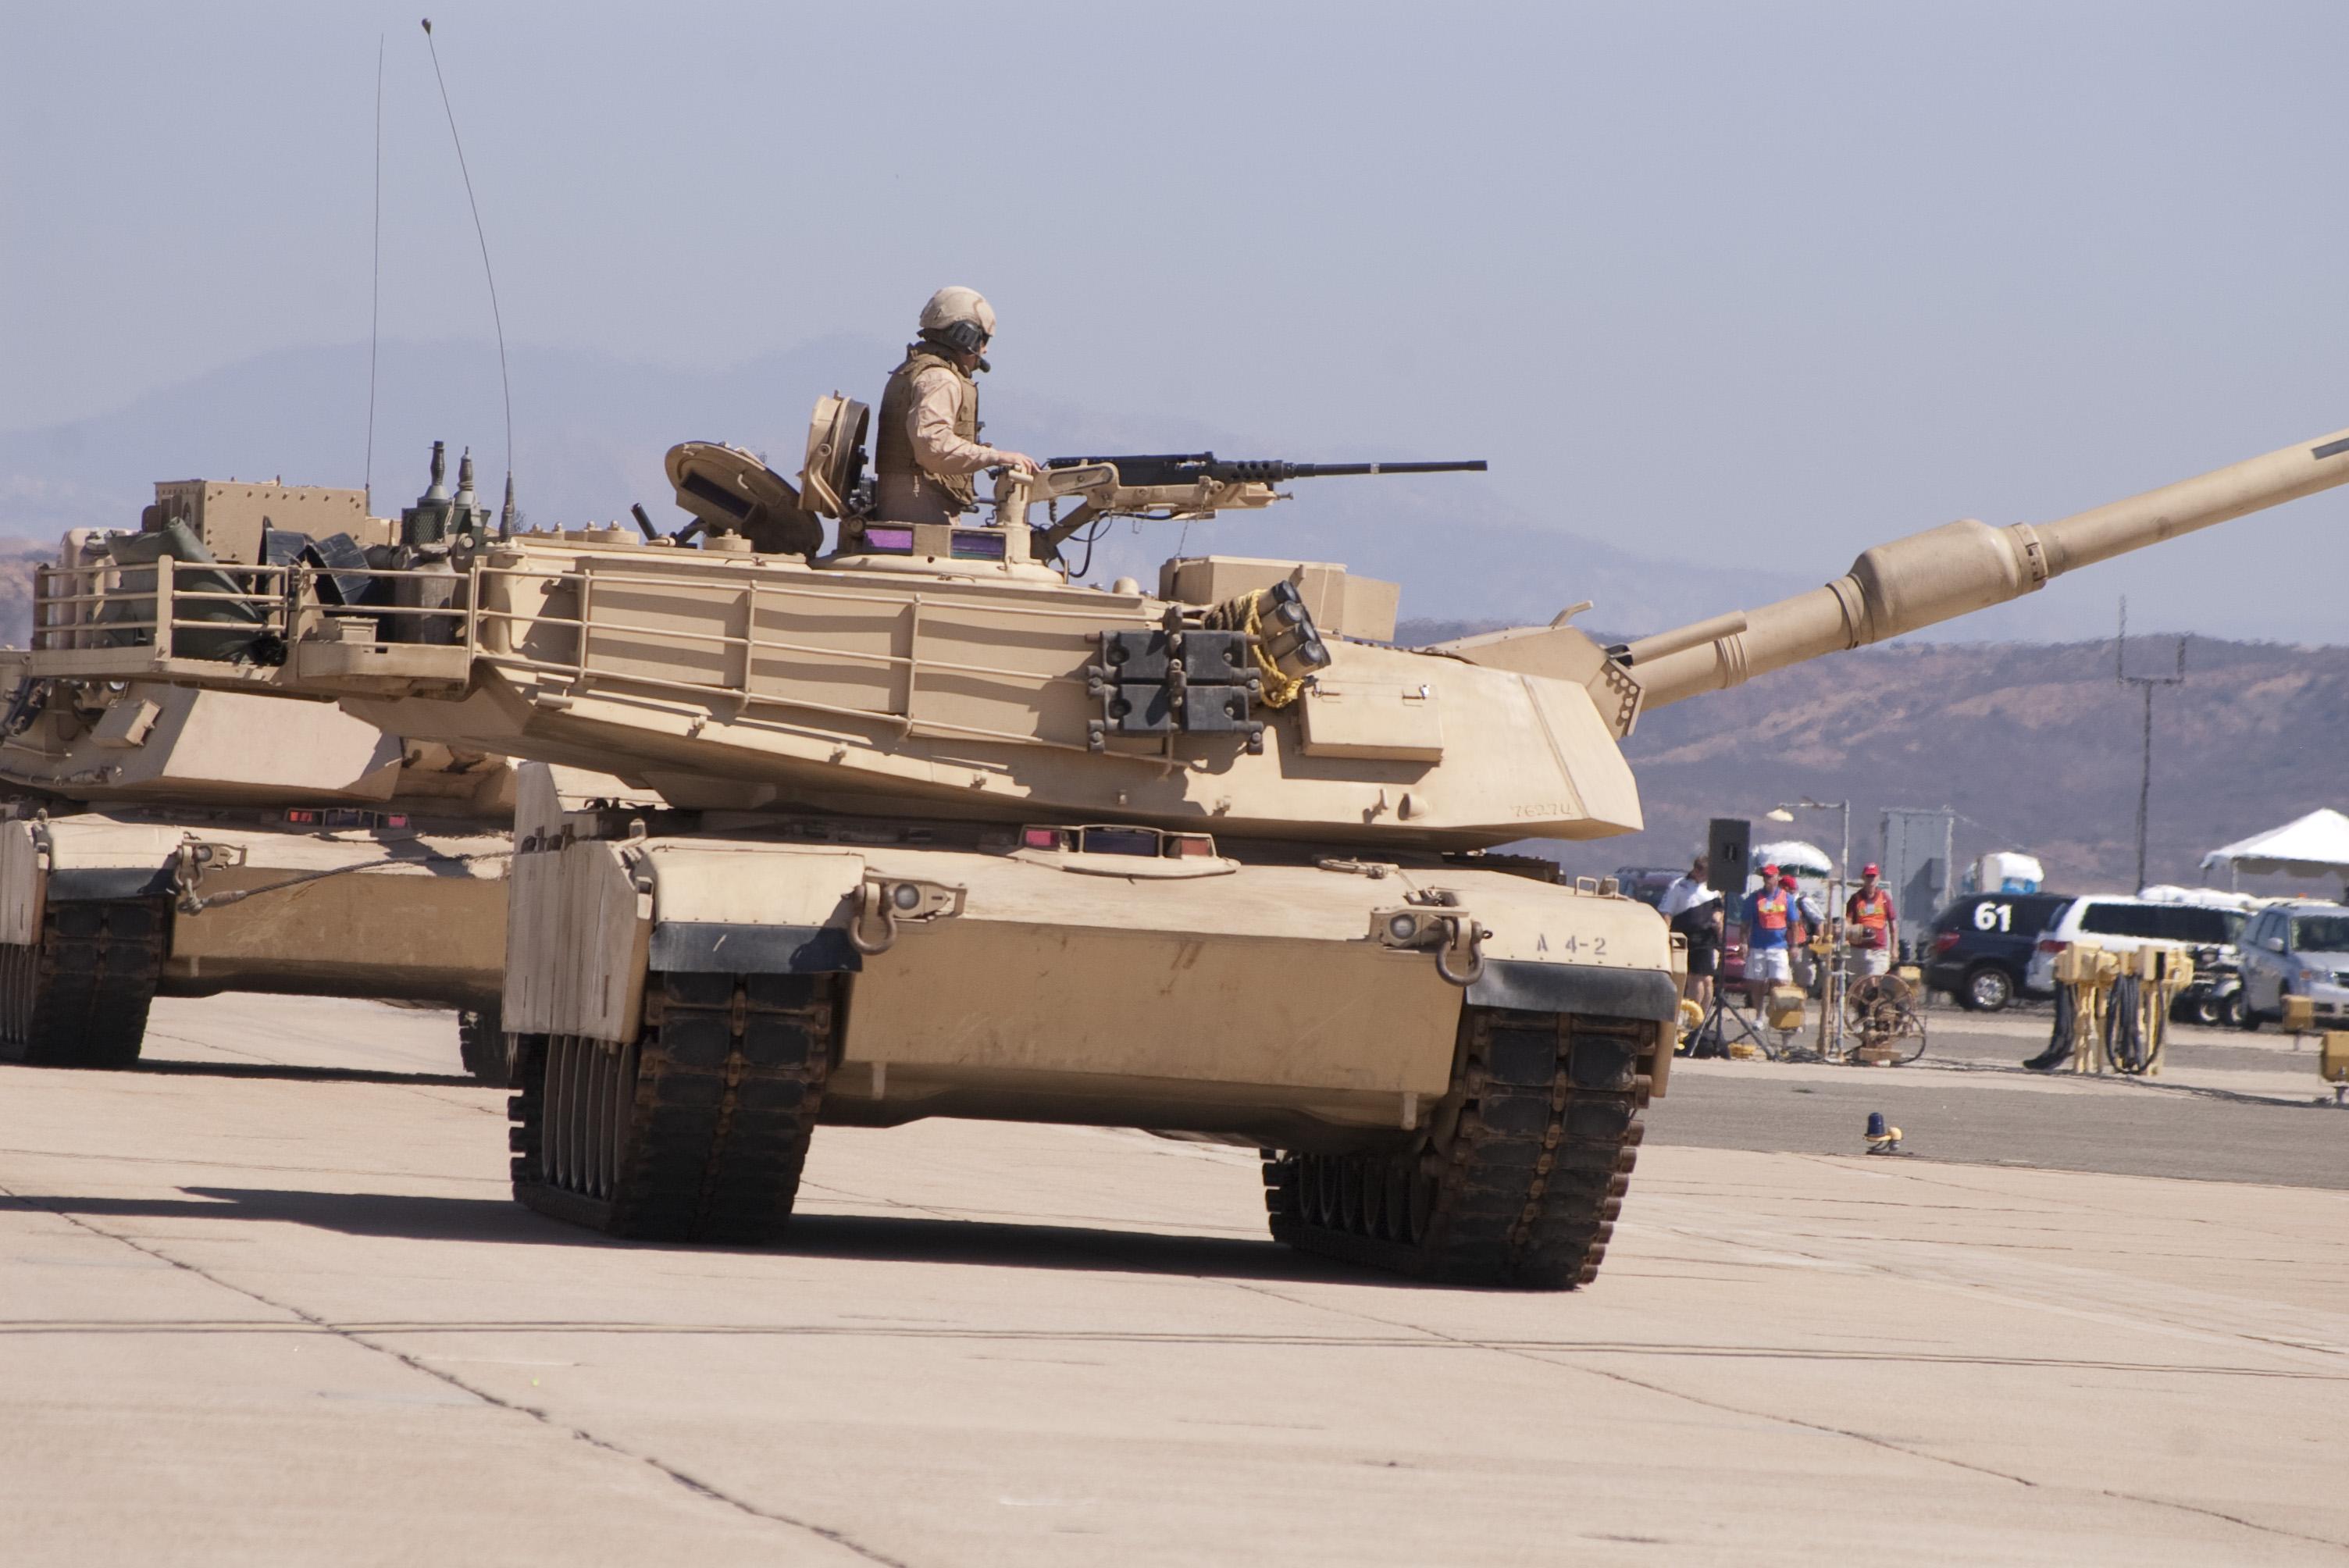 M1_tank.jpg